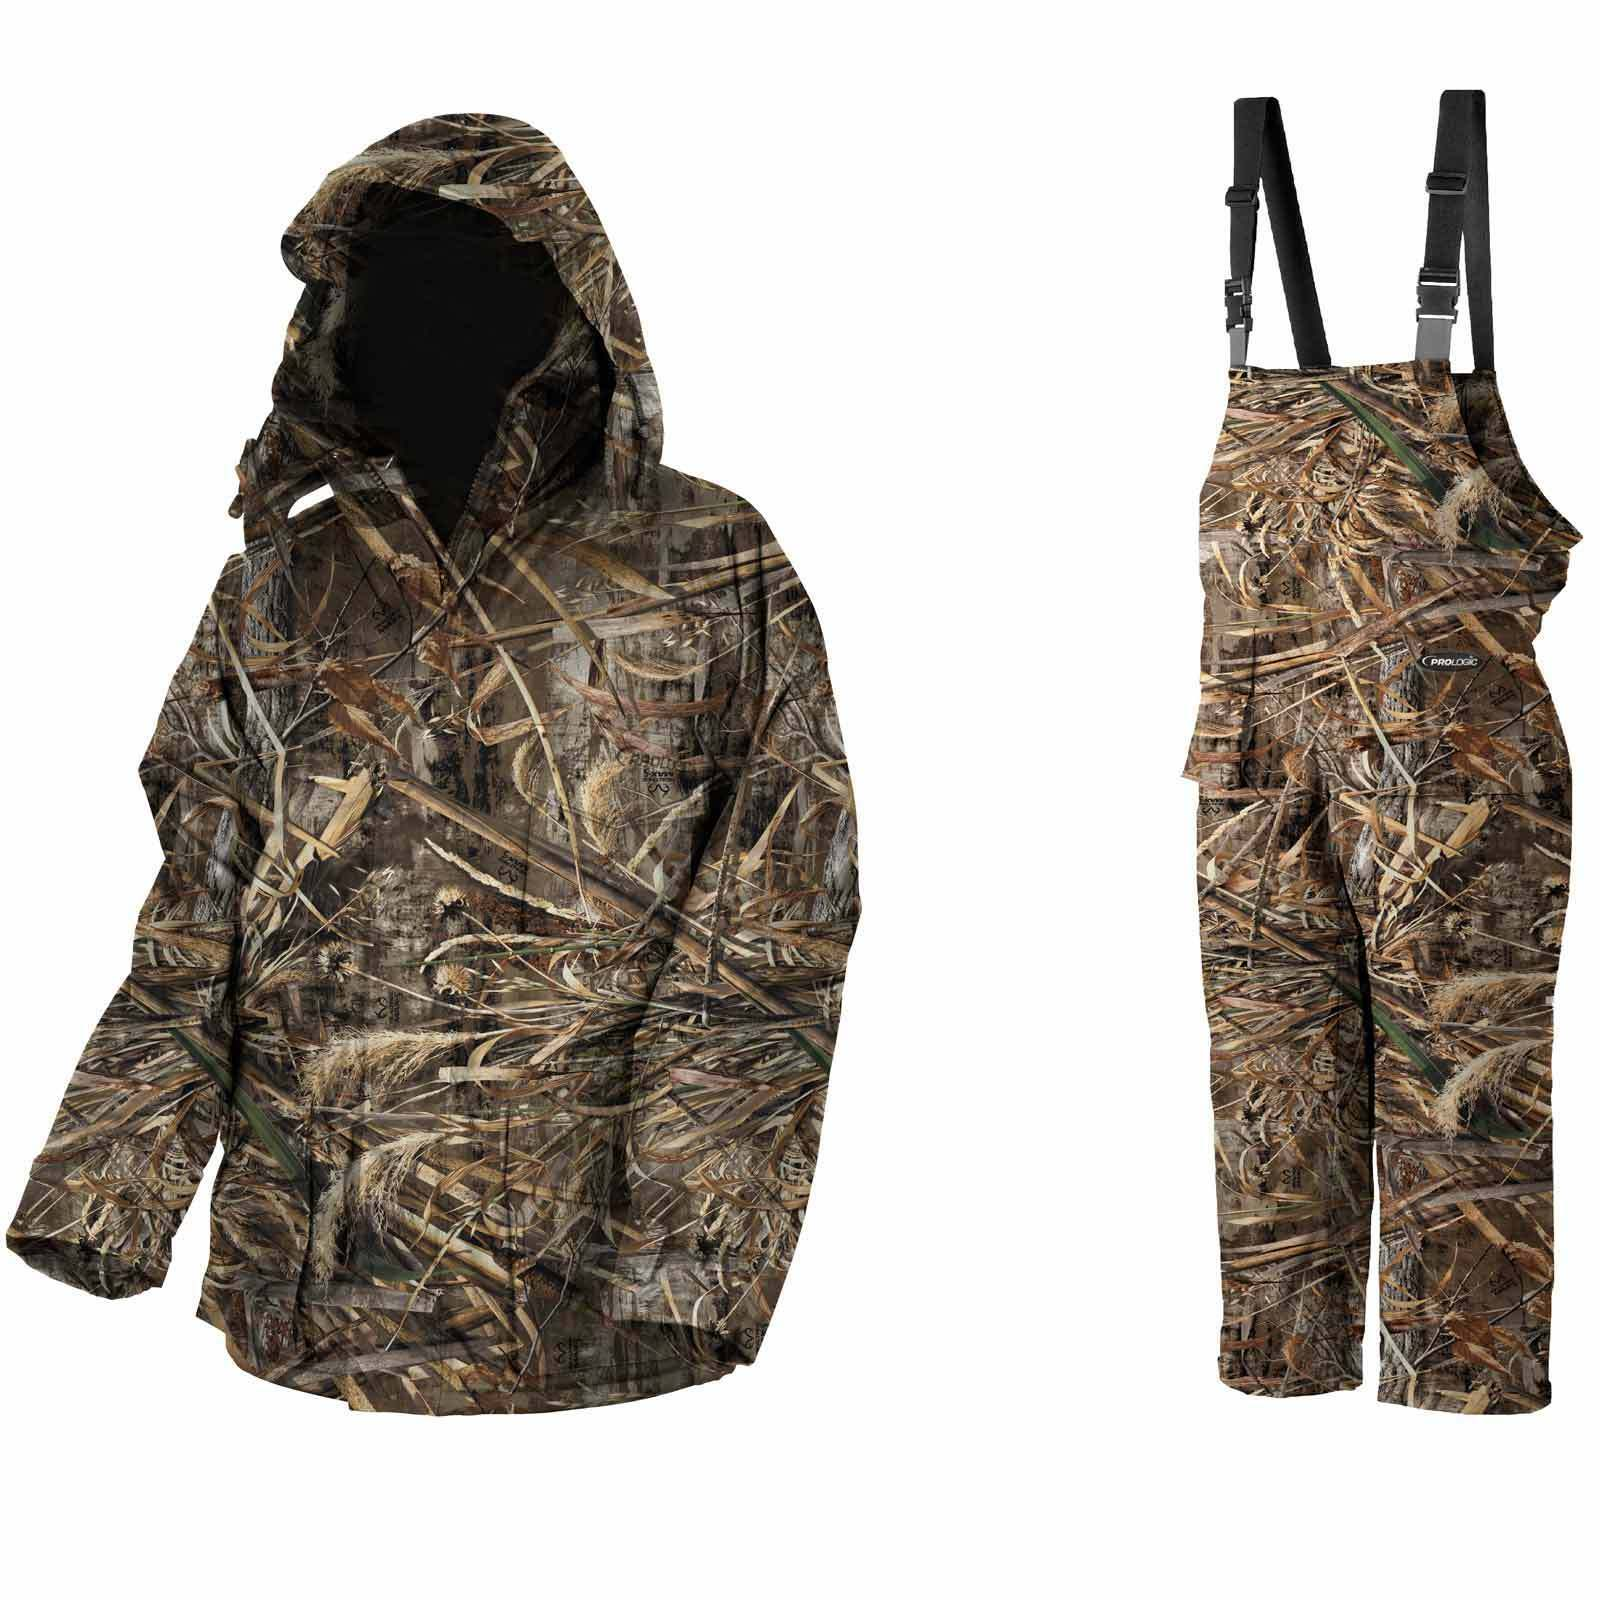 ProLogic a pesca inverno Tutamax5 comfort termo Suit 2 divisoriTaglia L